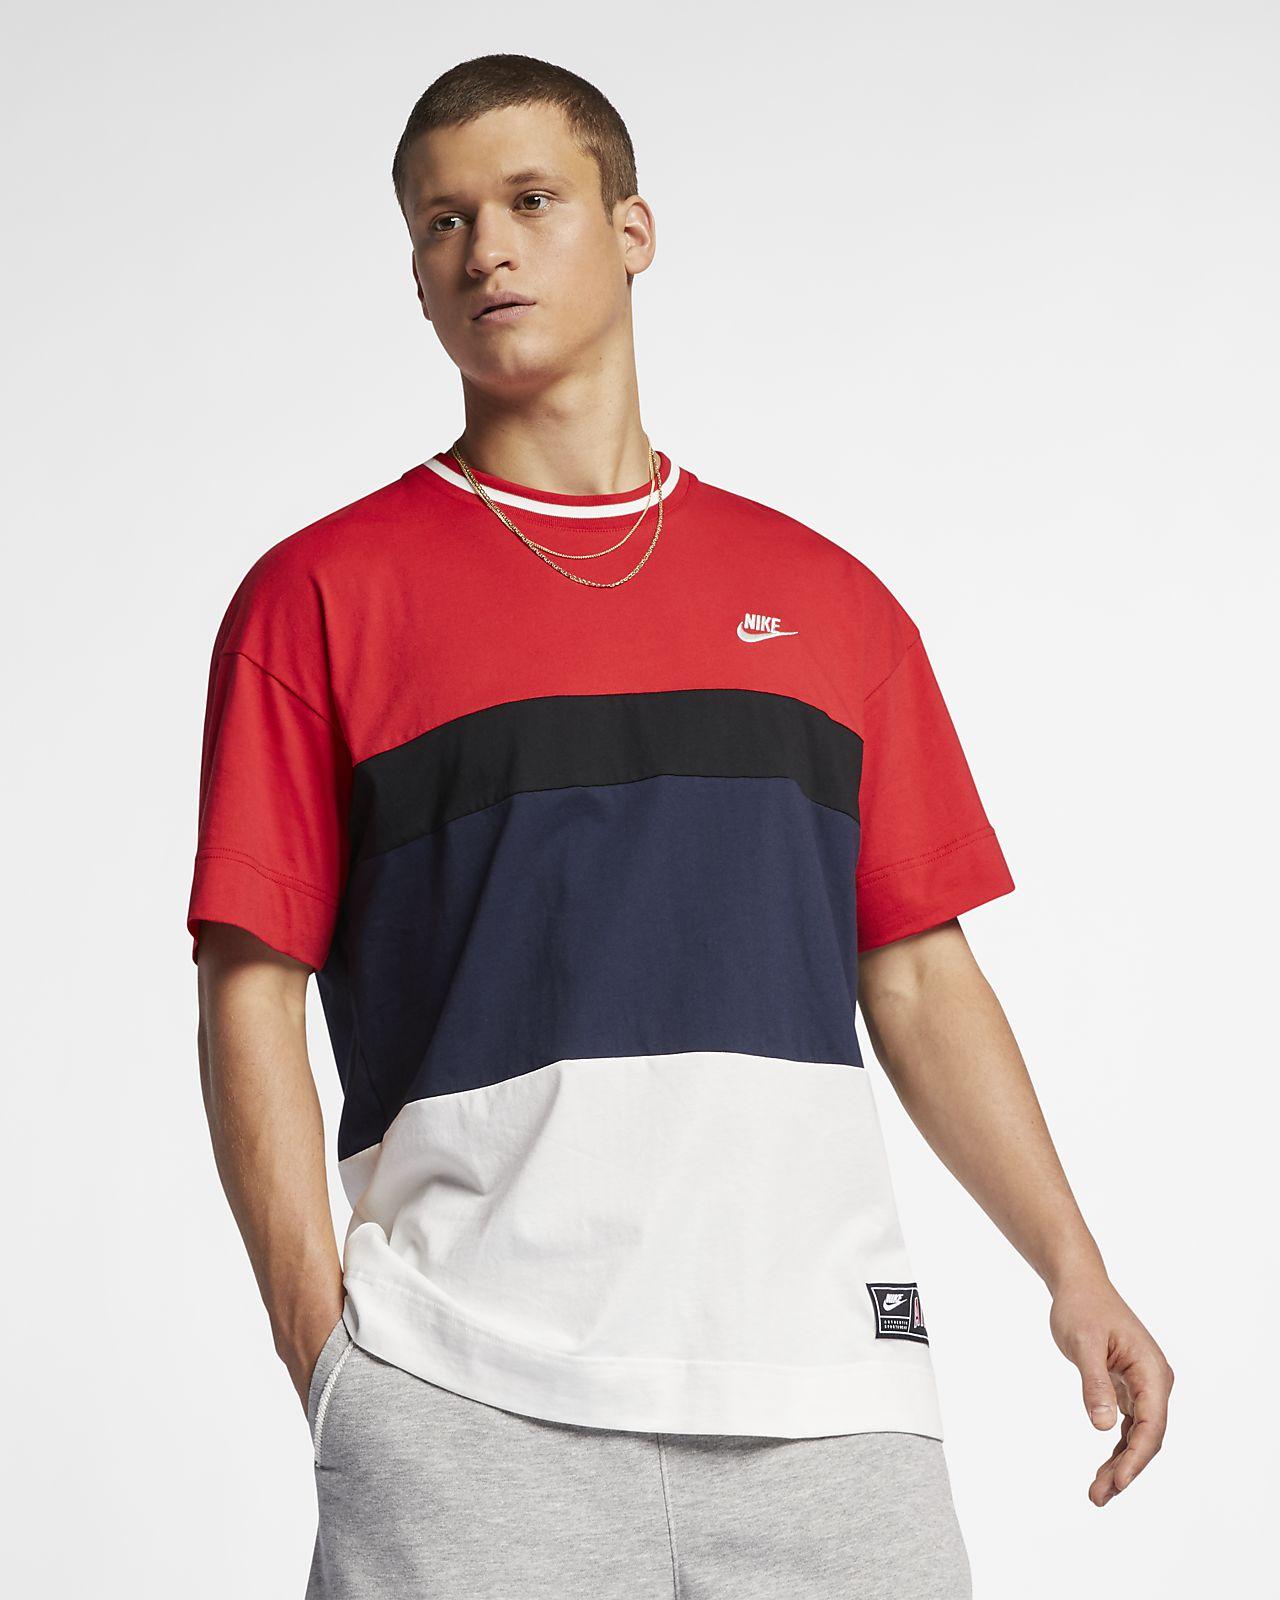 Мужская футболка с коротким рукавом Nike Air